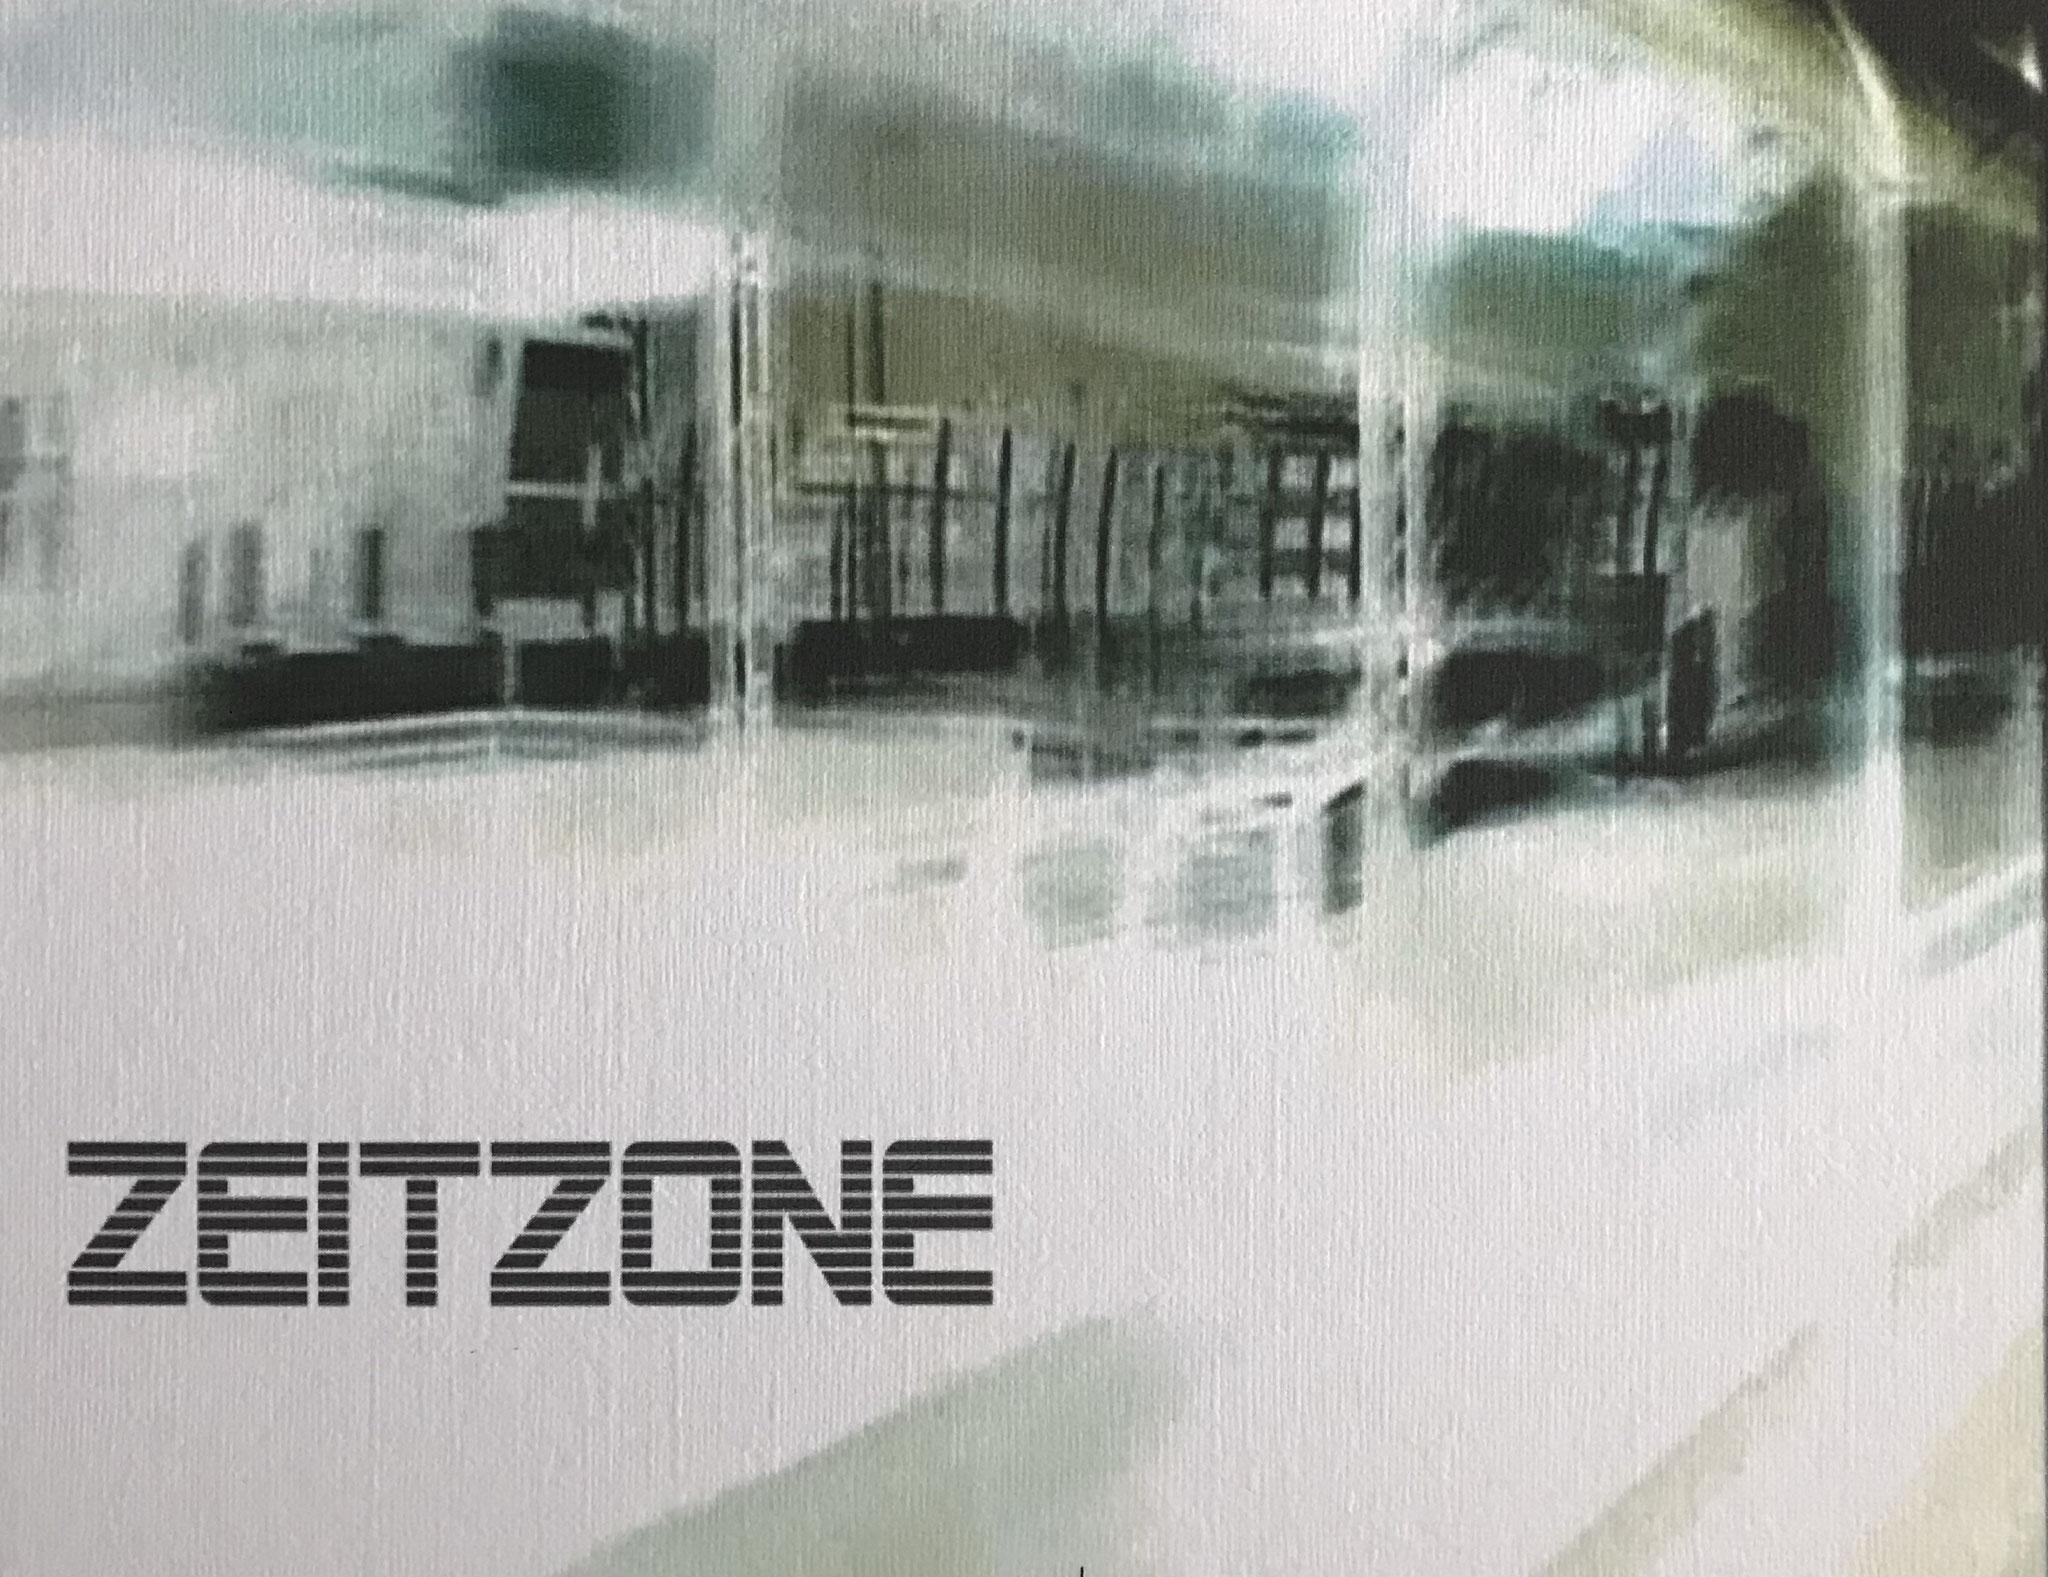 """Zeitzone"" Digital Print 2004"